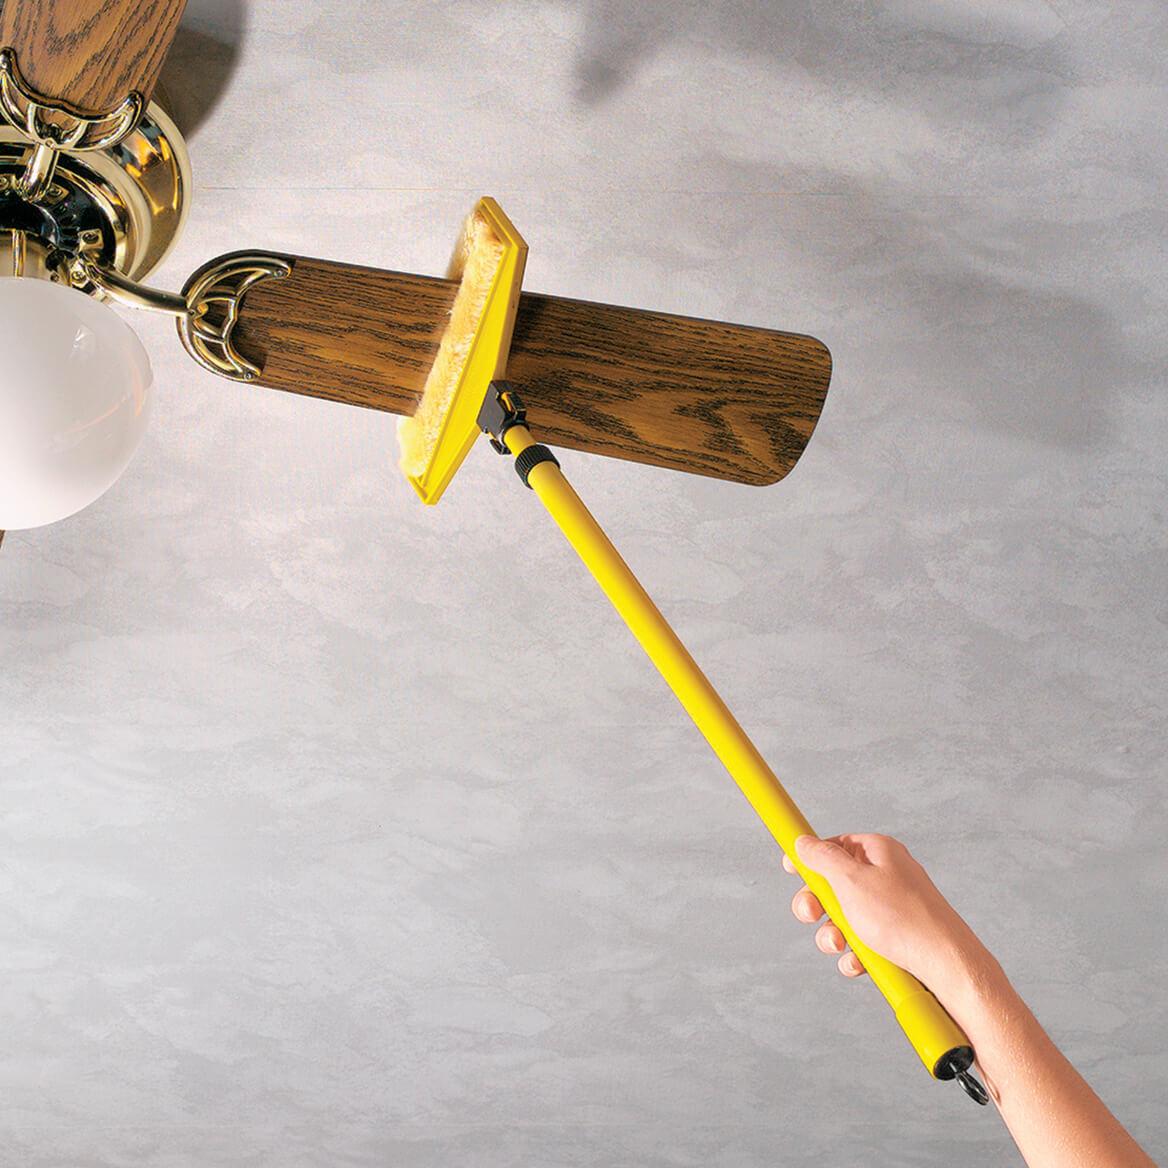 Ceiling fan duster ceiling fan cleaning tool miles kimball ceiling fan duster aloadofball Images